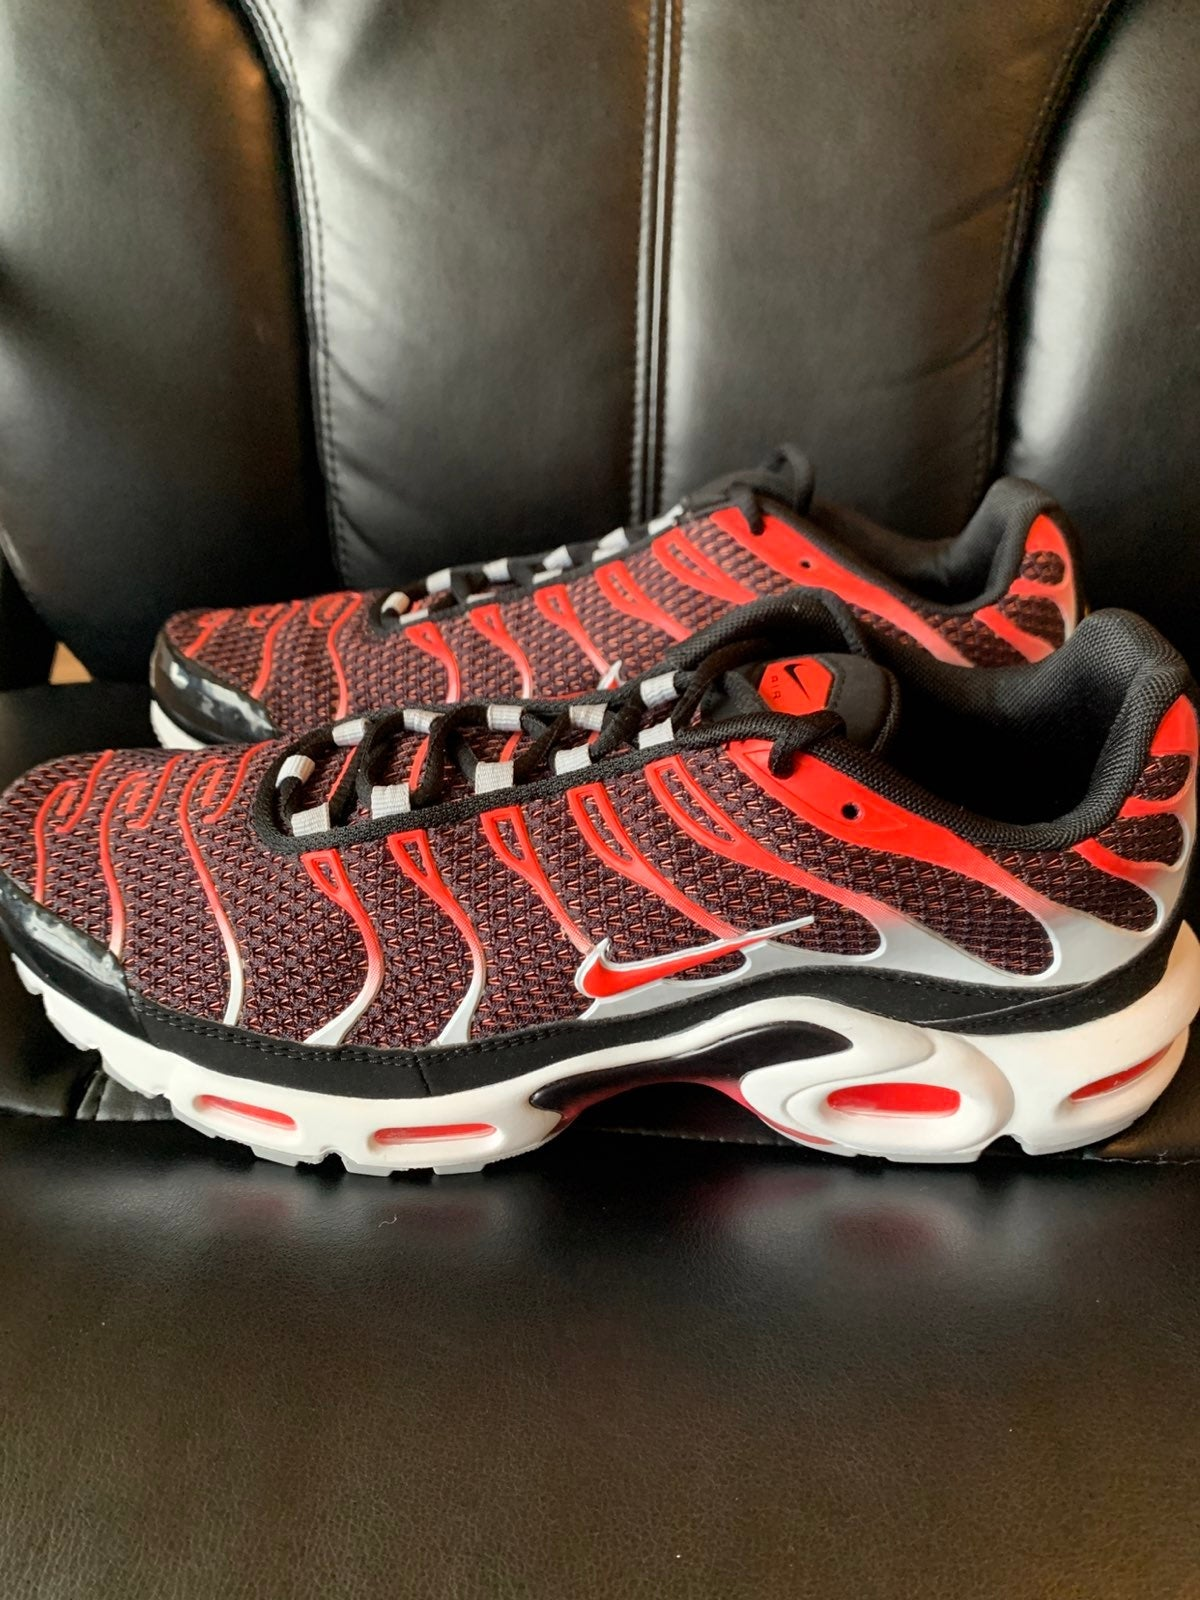 New Nike Air Max Plus TN Tuned Hot Lava